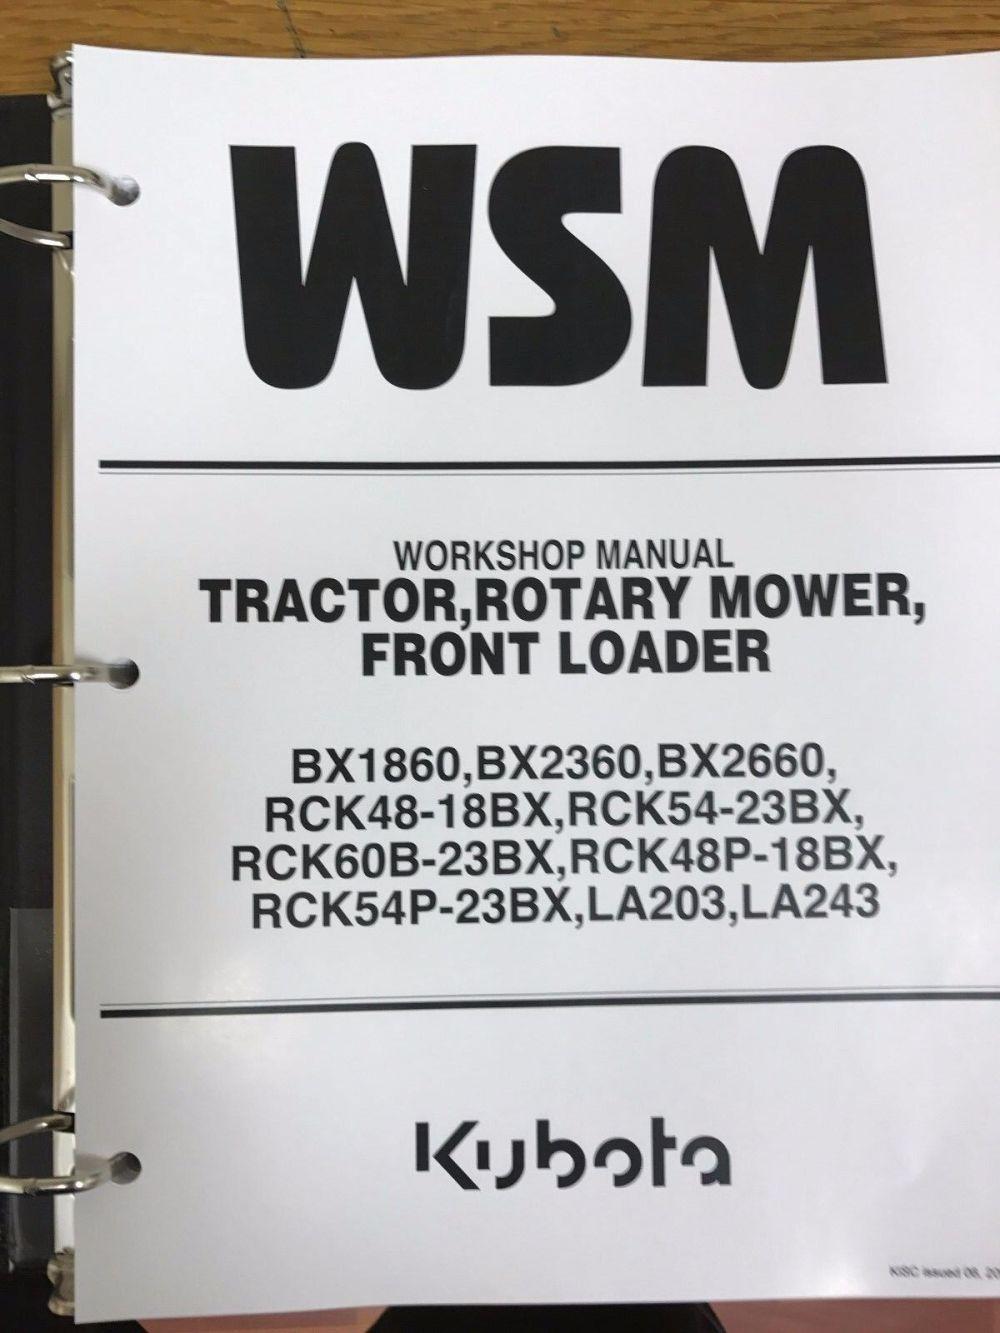 medium resolution of kubota bx1860 bx2360 bx2660 tractor workshop service manual for sale online ebay